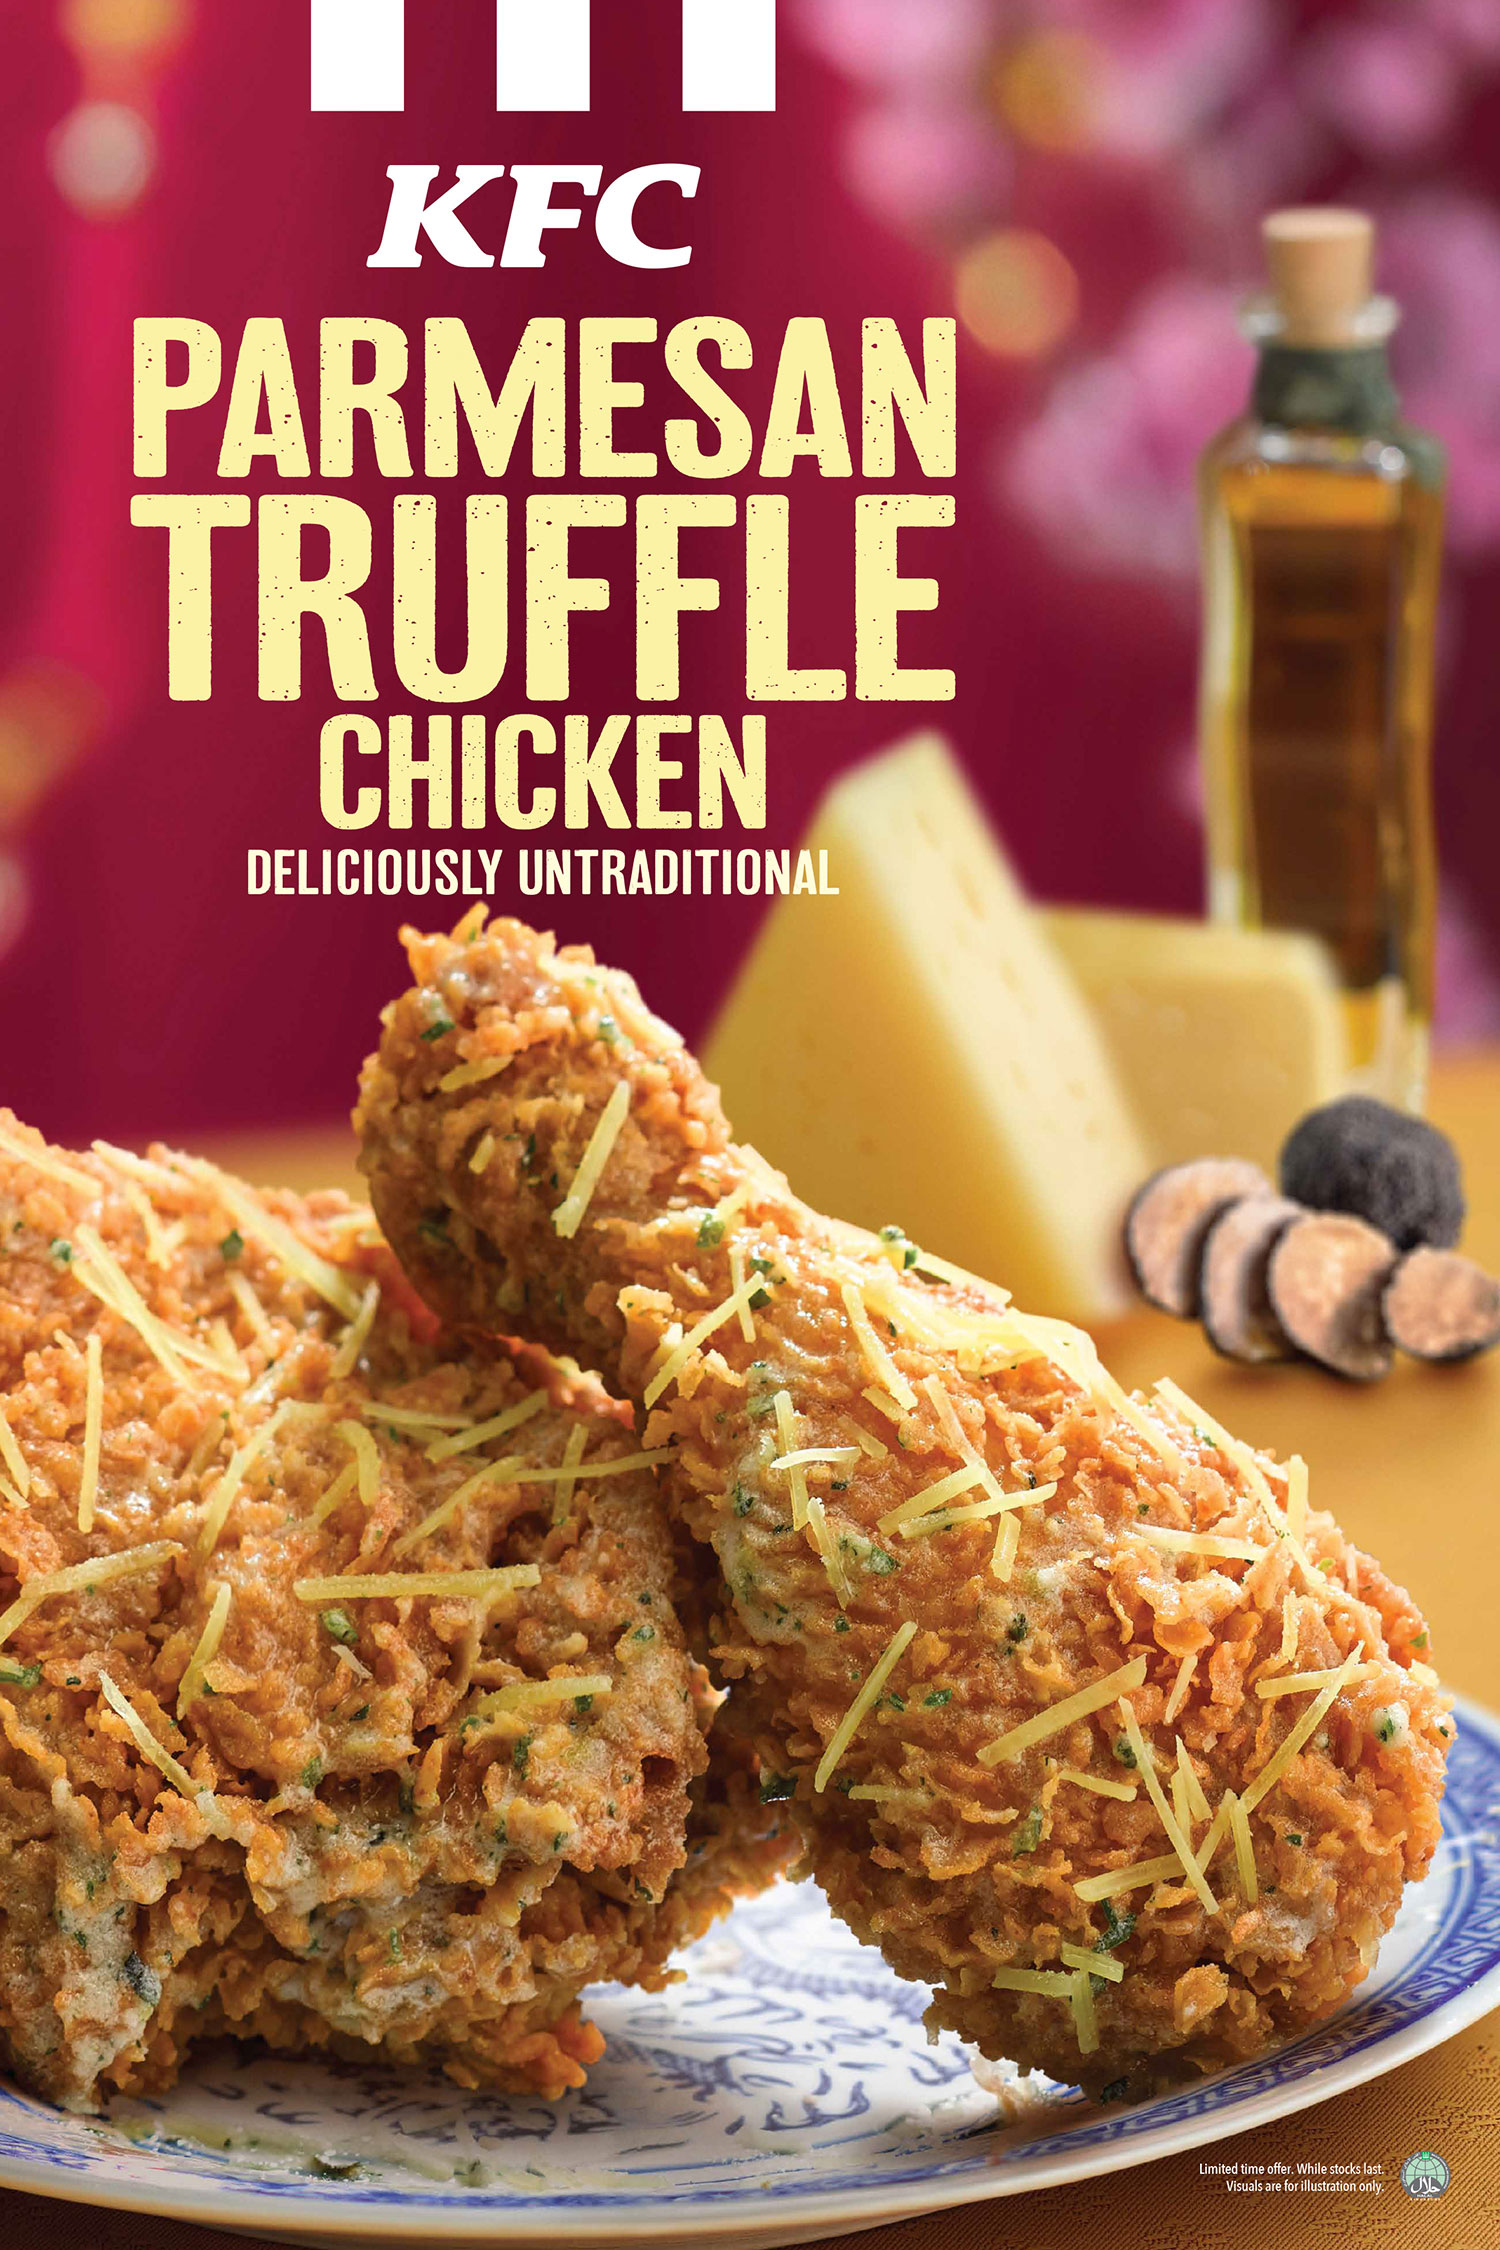 KFC-Parmesan-Truffle-Chicken